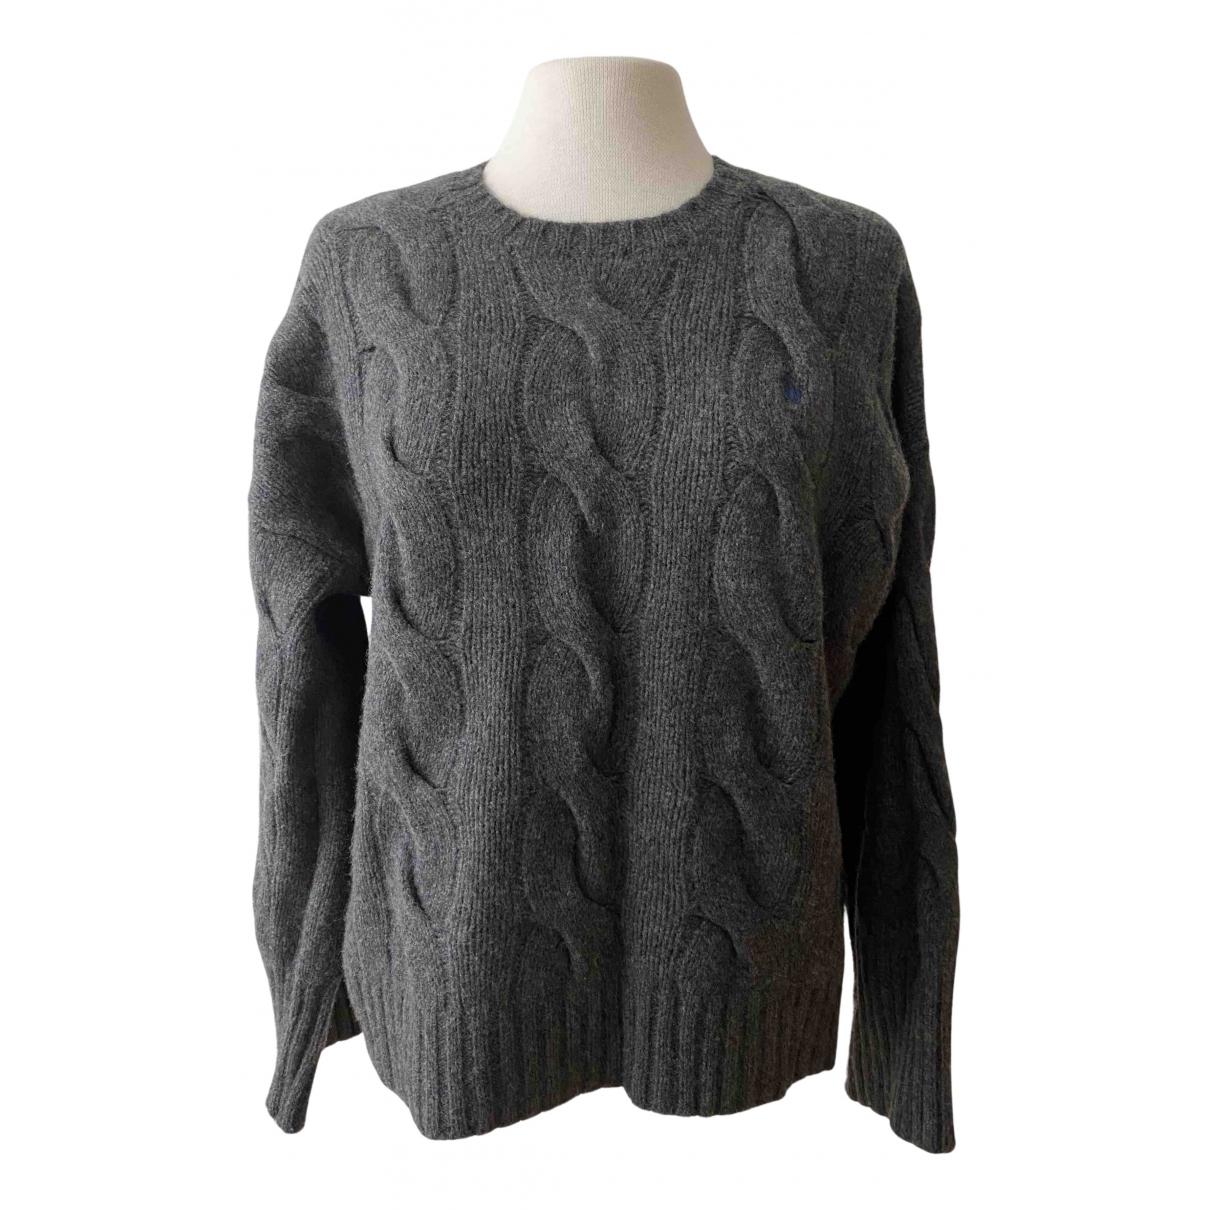 Polo Ralph Lauren N Anthracite Wool Knitwear for Women M International